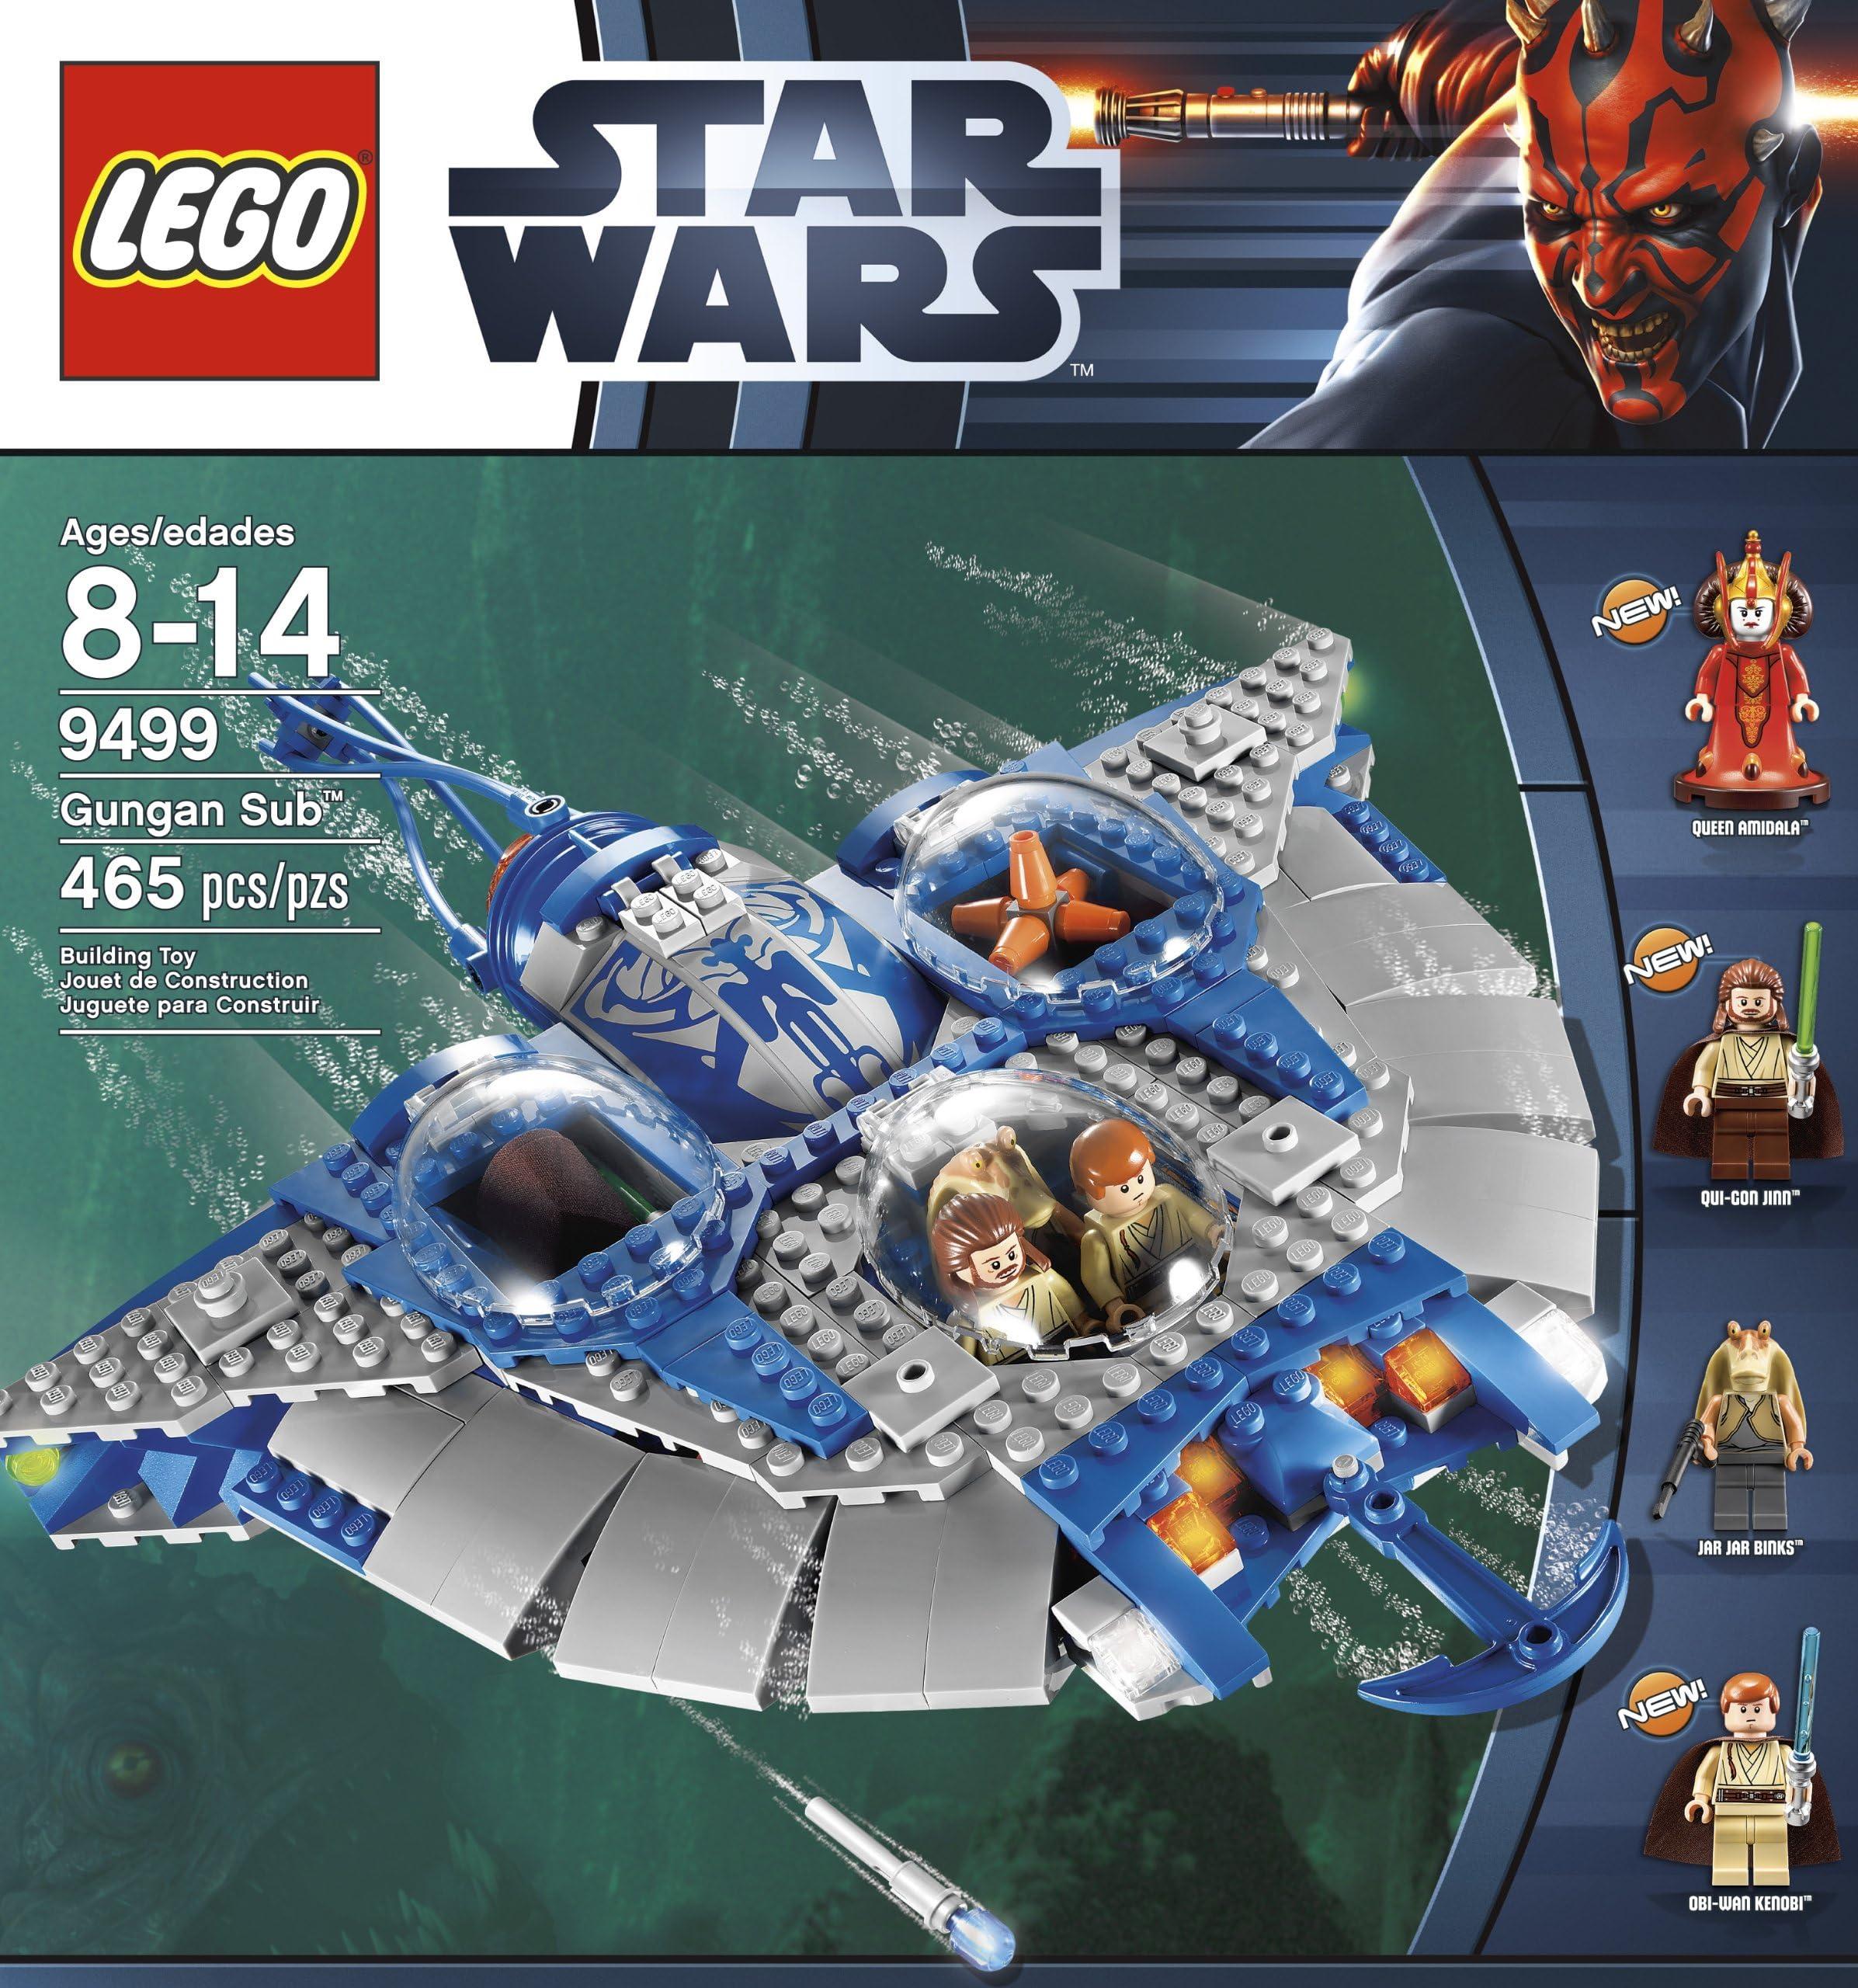 laser épée Gungan sub LEGO star wars figurine Obi-wan Kenobi sw409 de 9499 incl